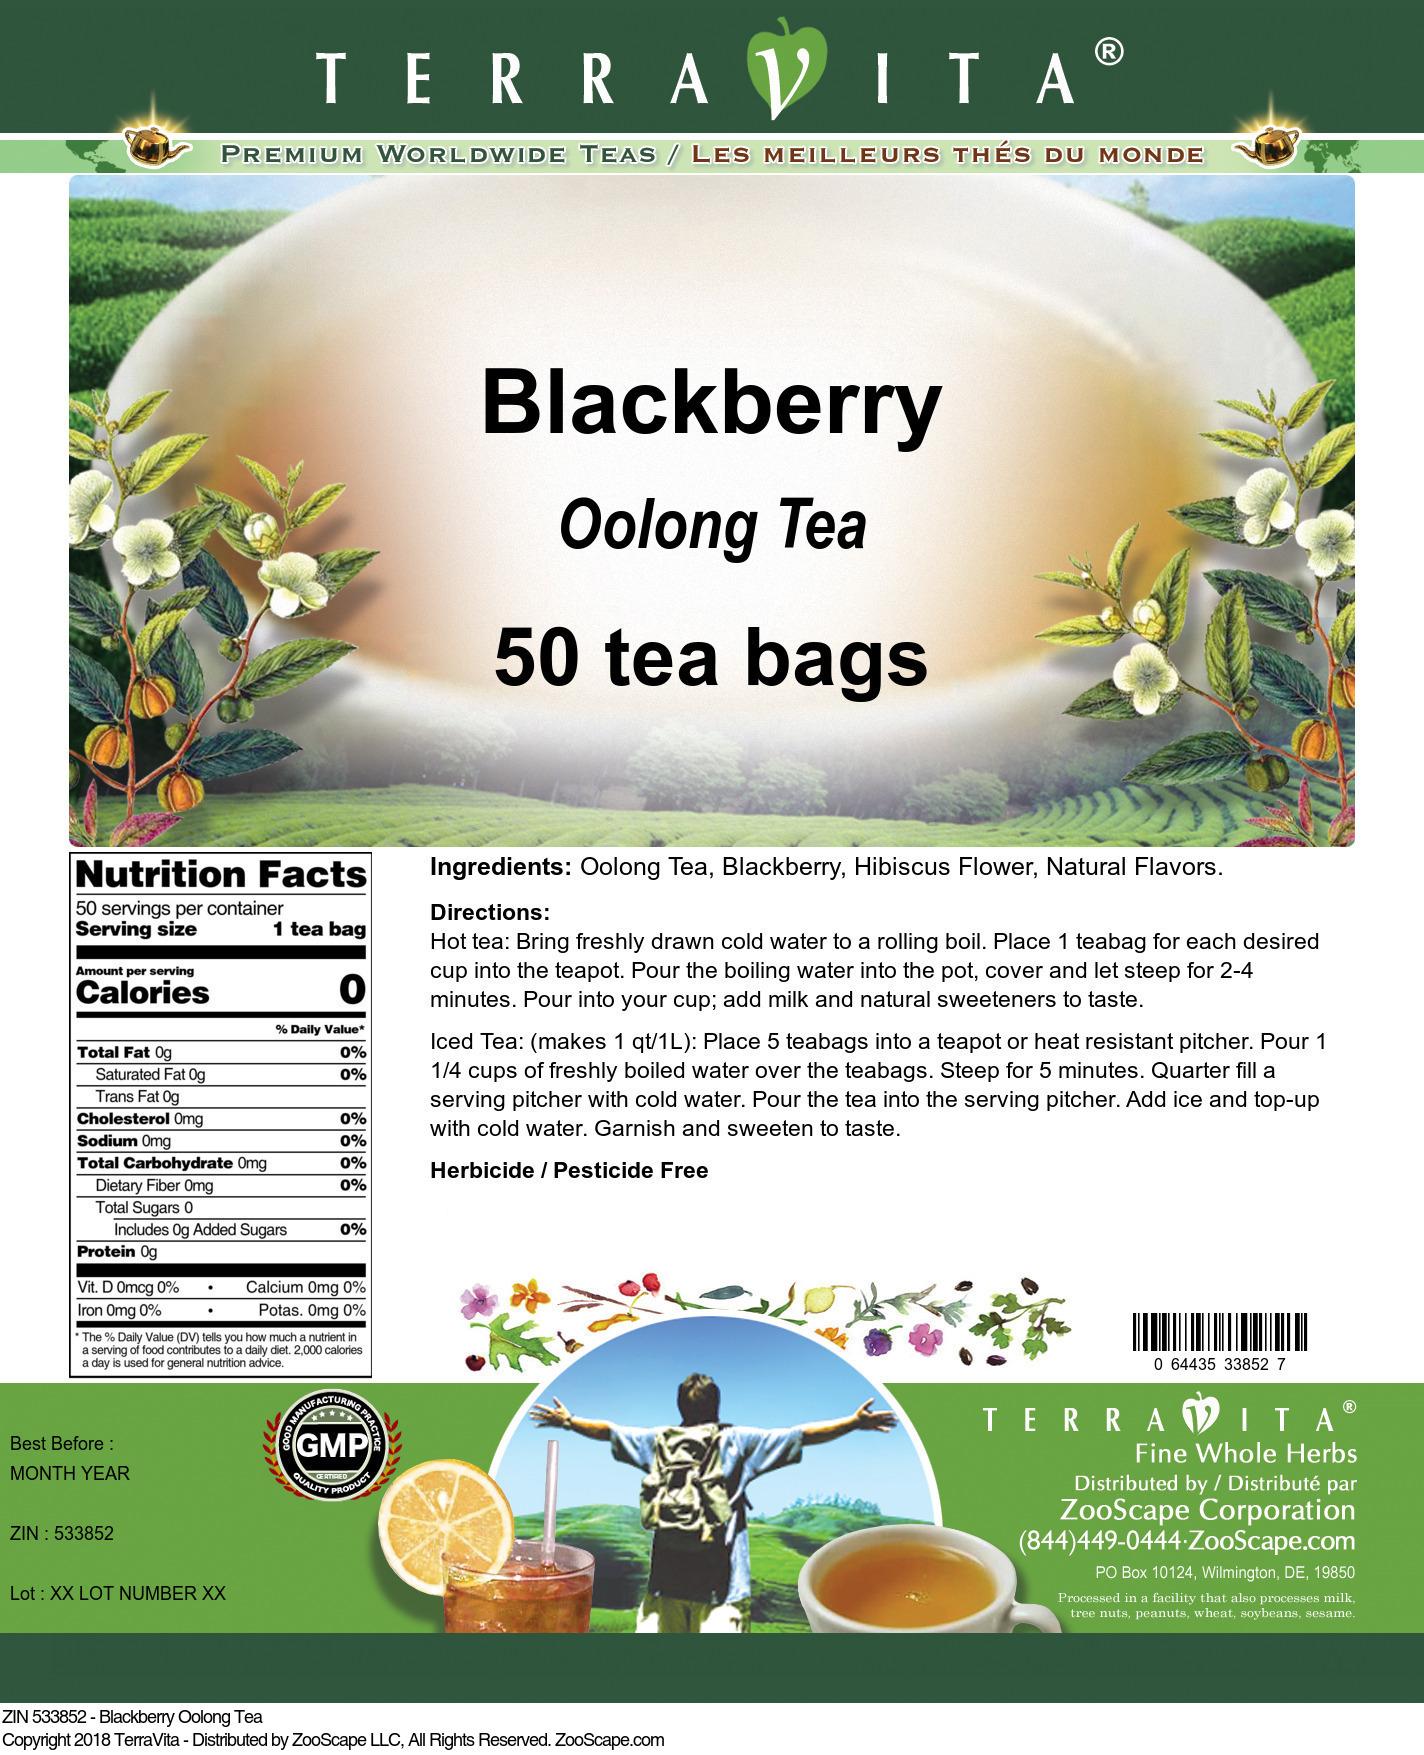 Blackberry Oolong Tea